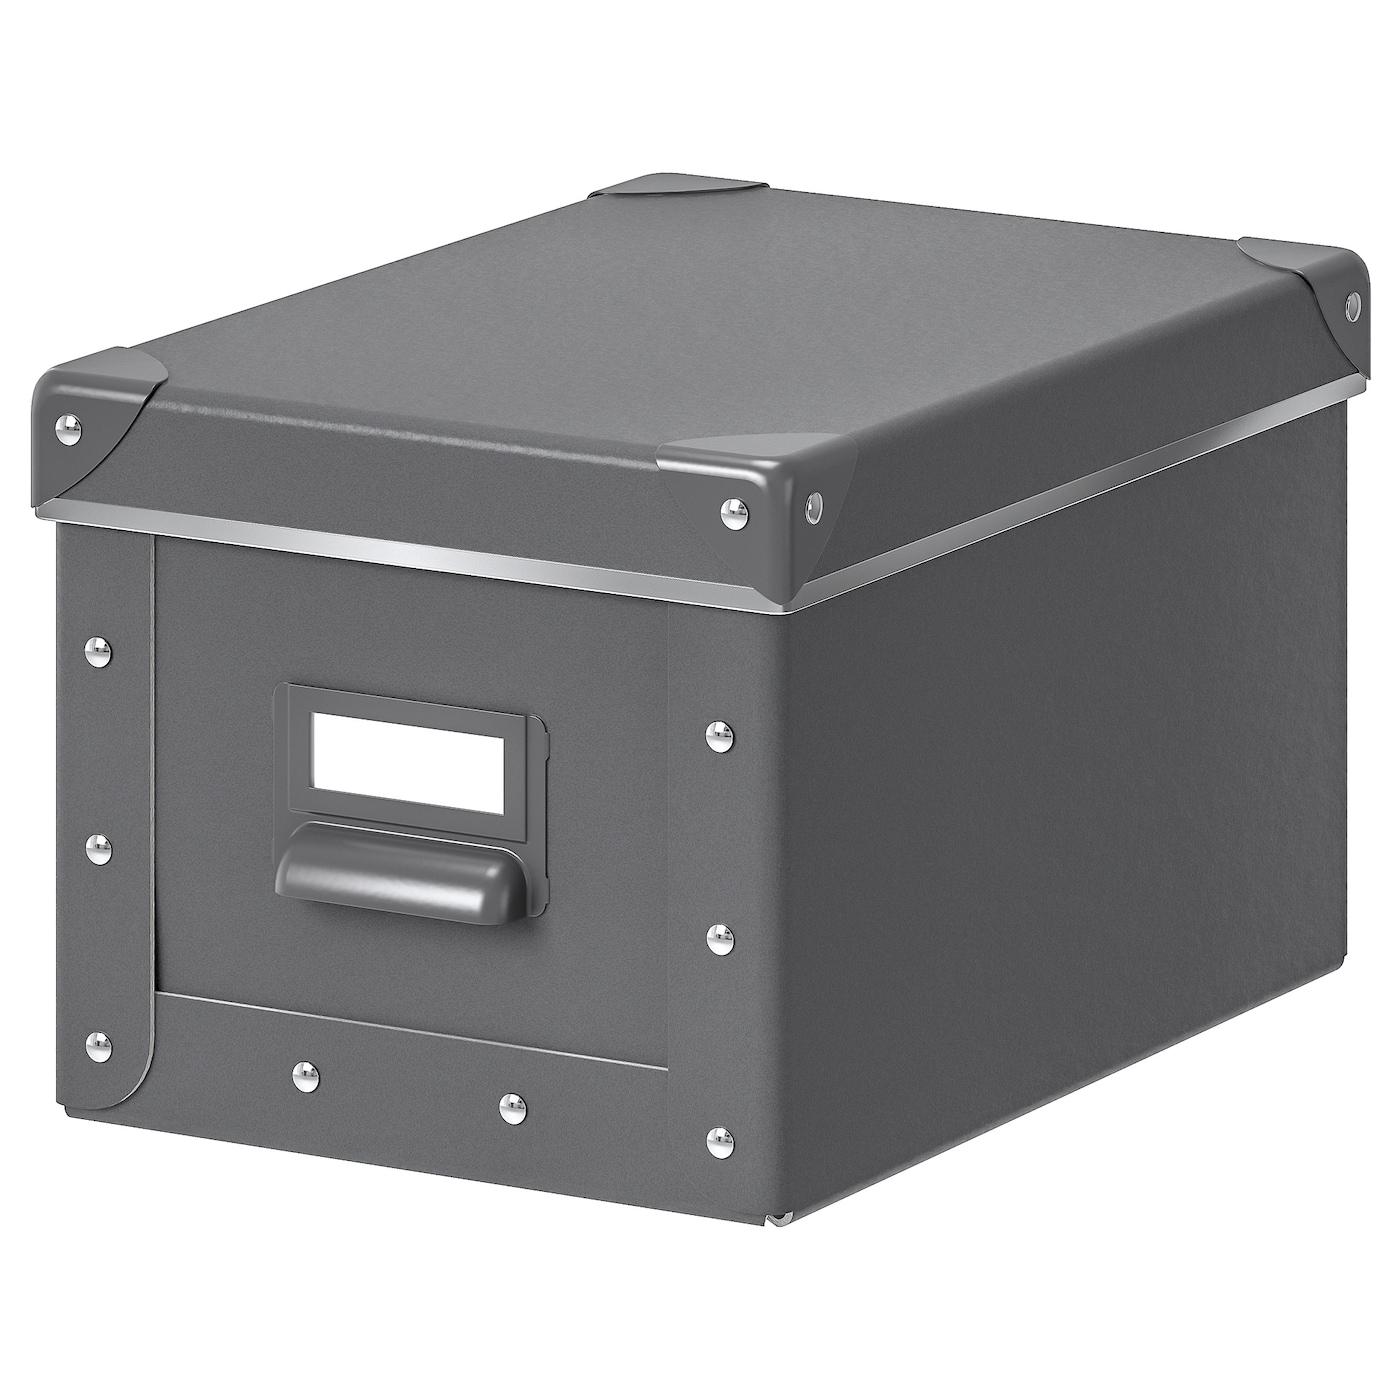 FJÄLLA Storage box with lid - dark grey - IKEA